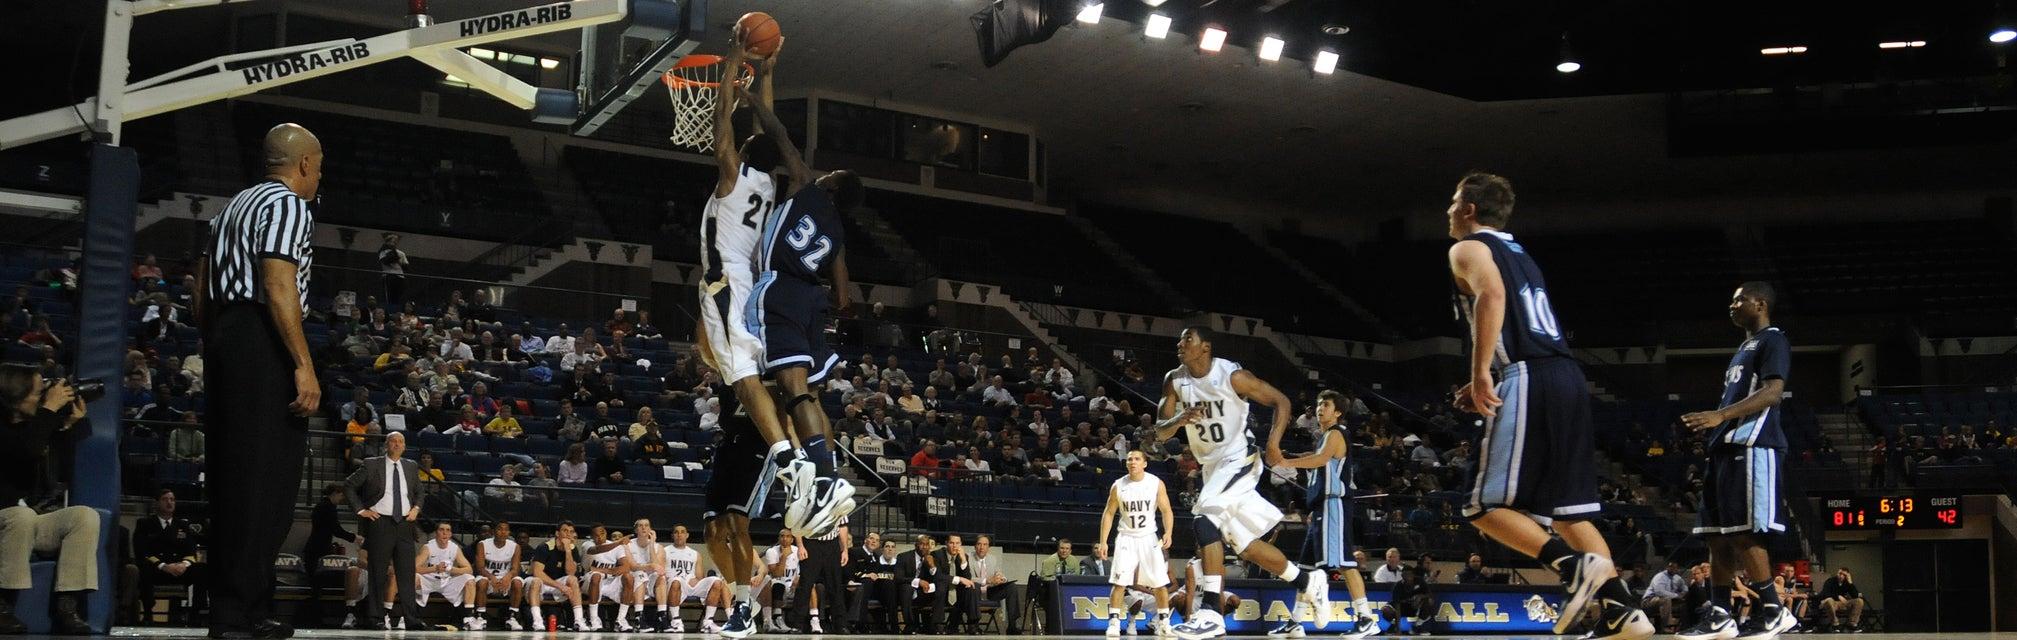 Navy Basketball Tickets